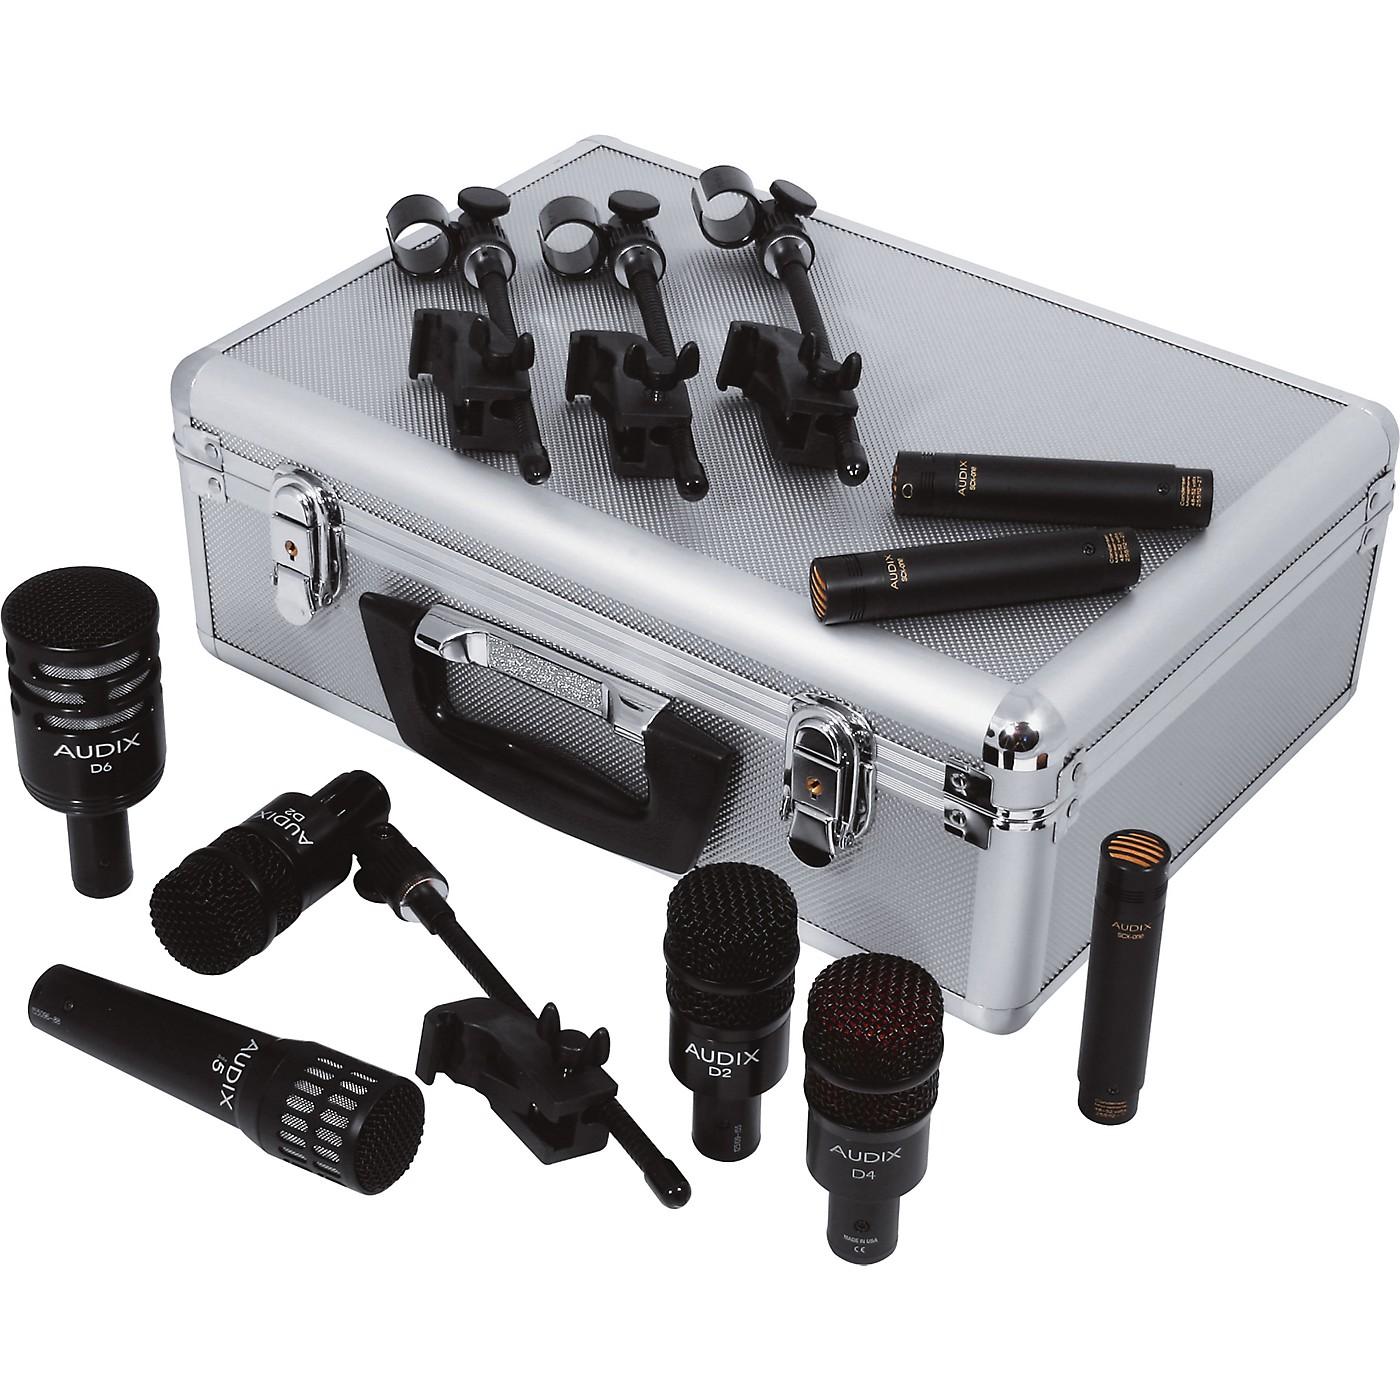 Audix DP Elite 8 Drum Microphone Pack thumbnail